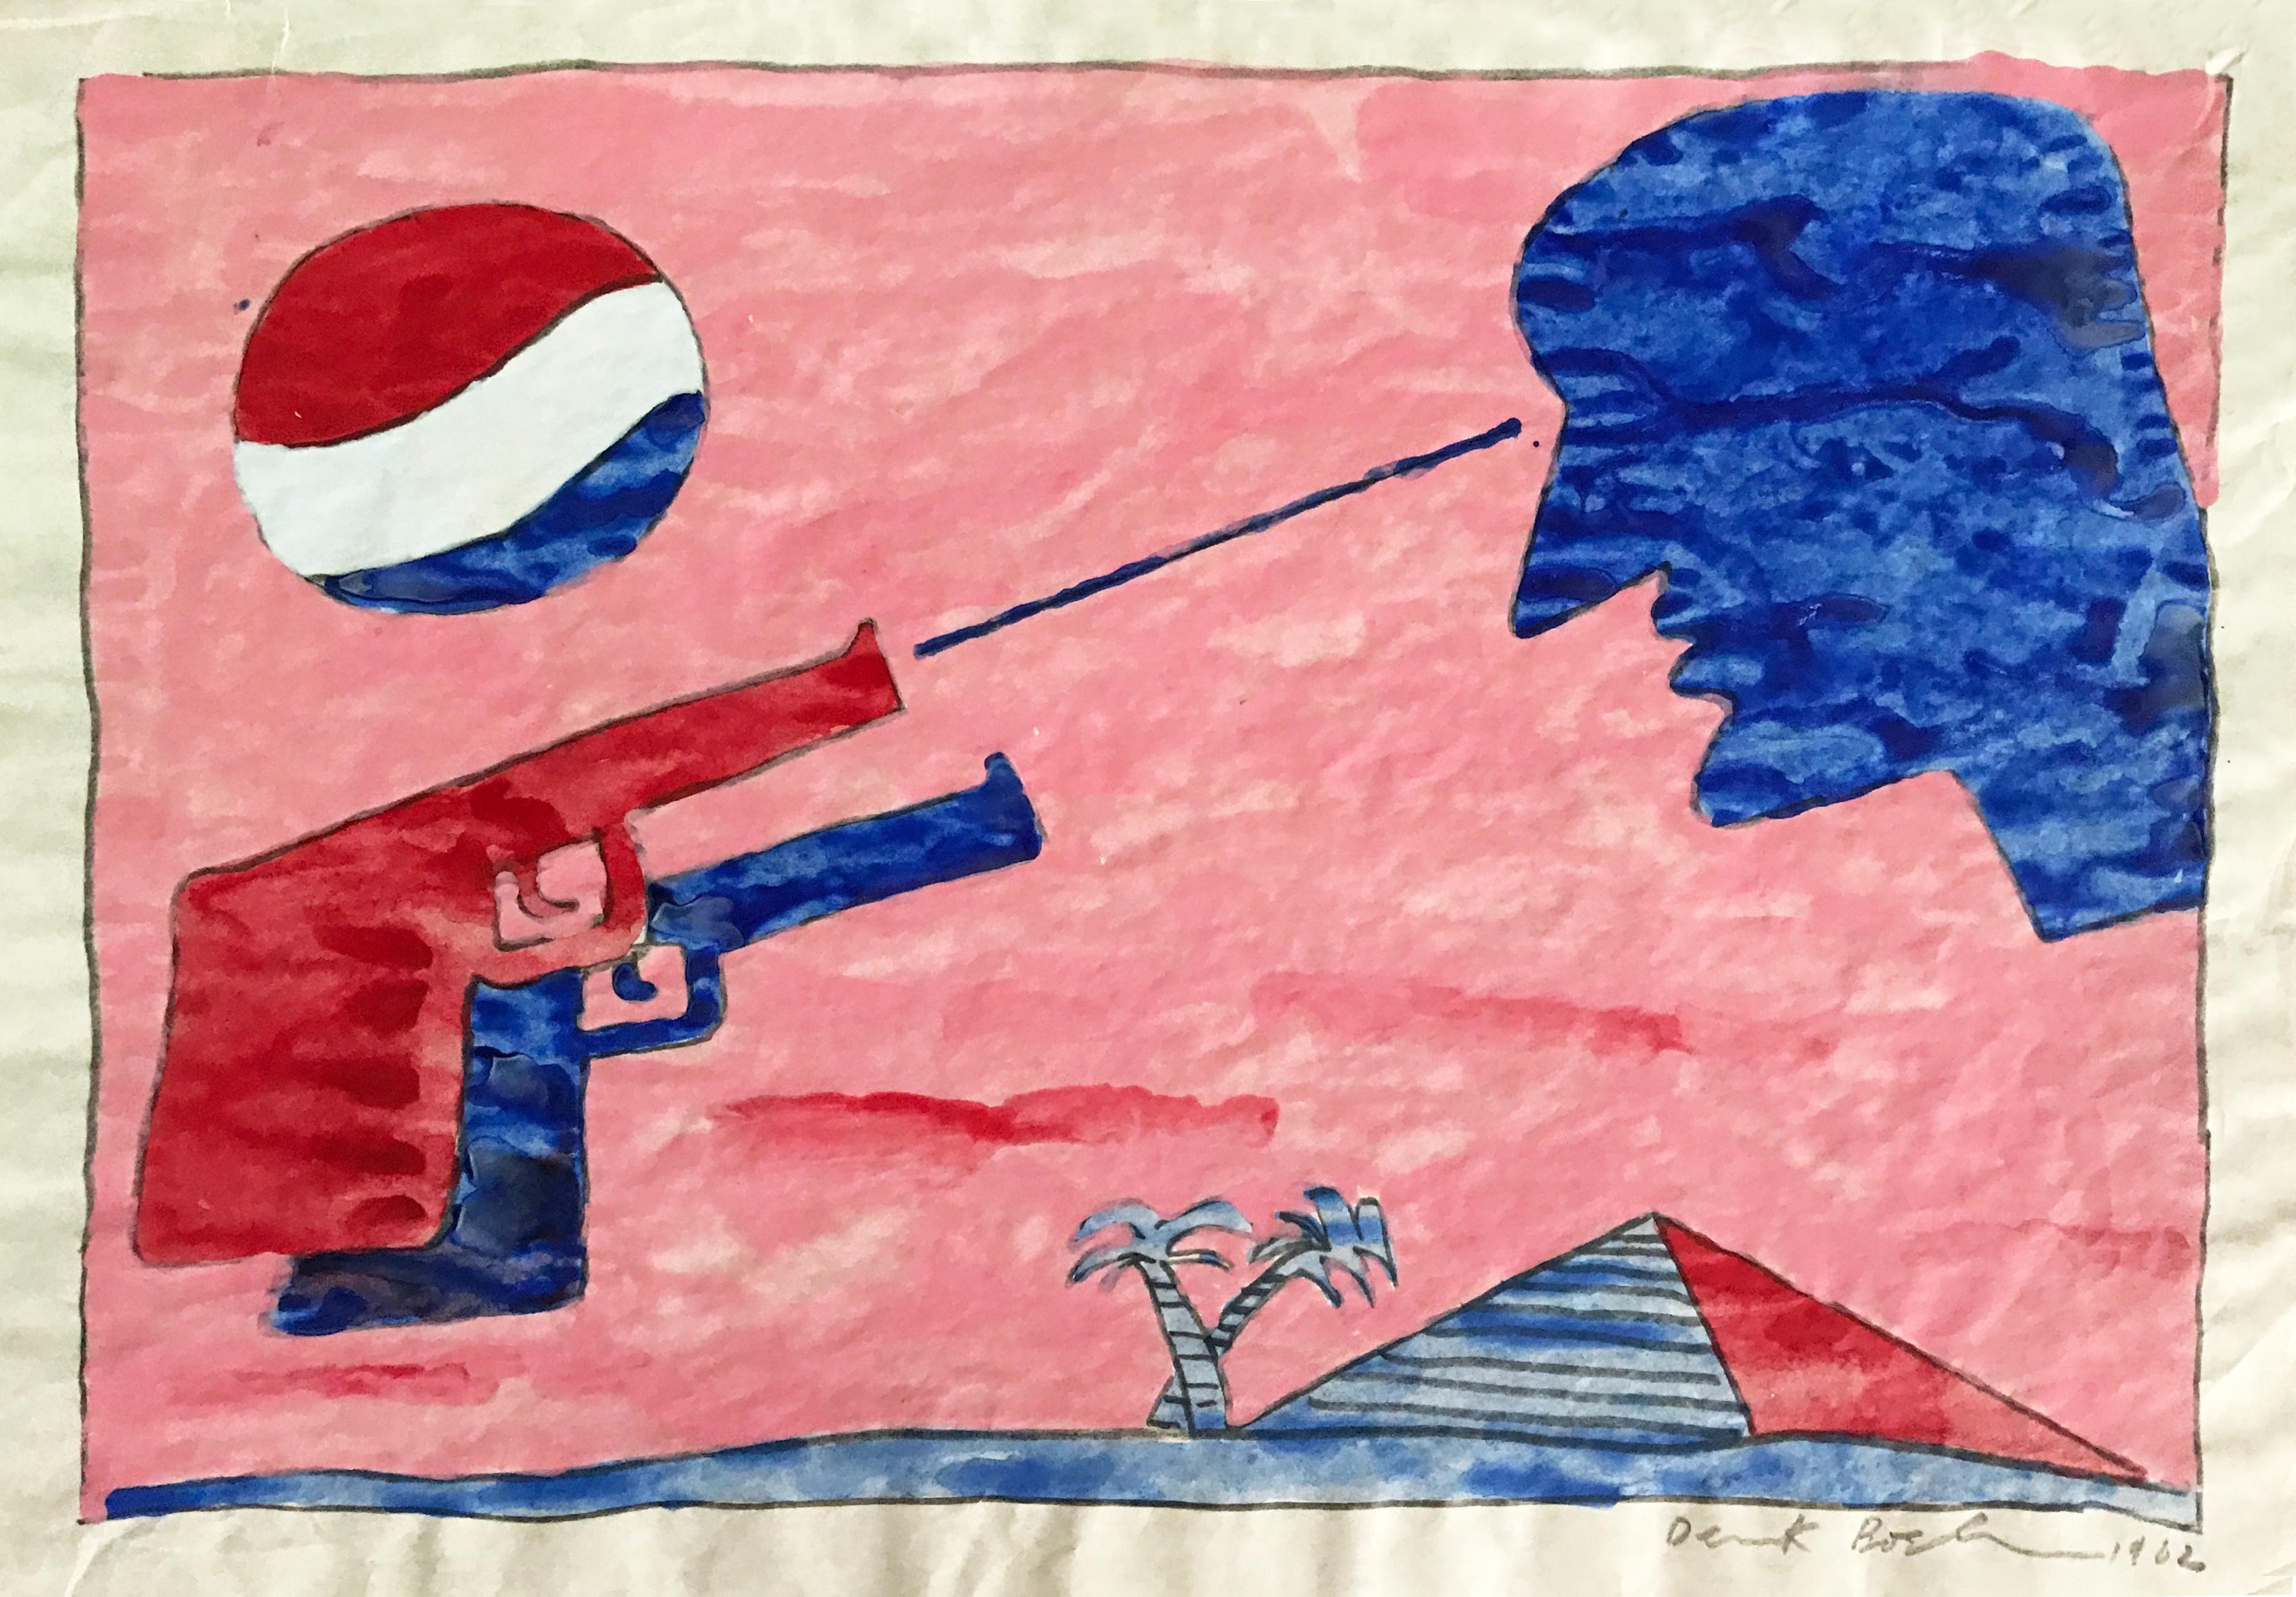 Pepsi Two Guns